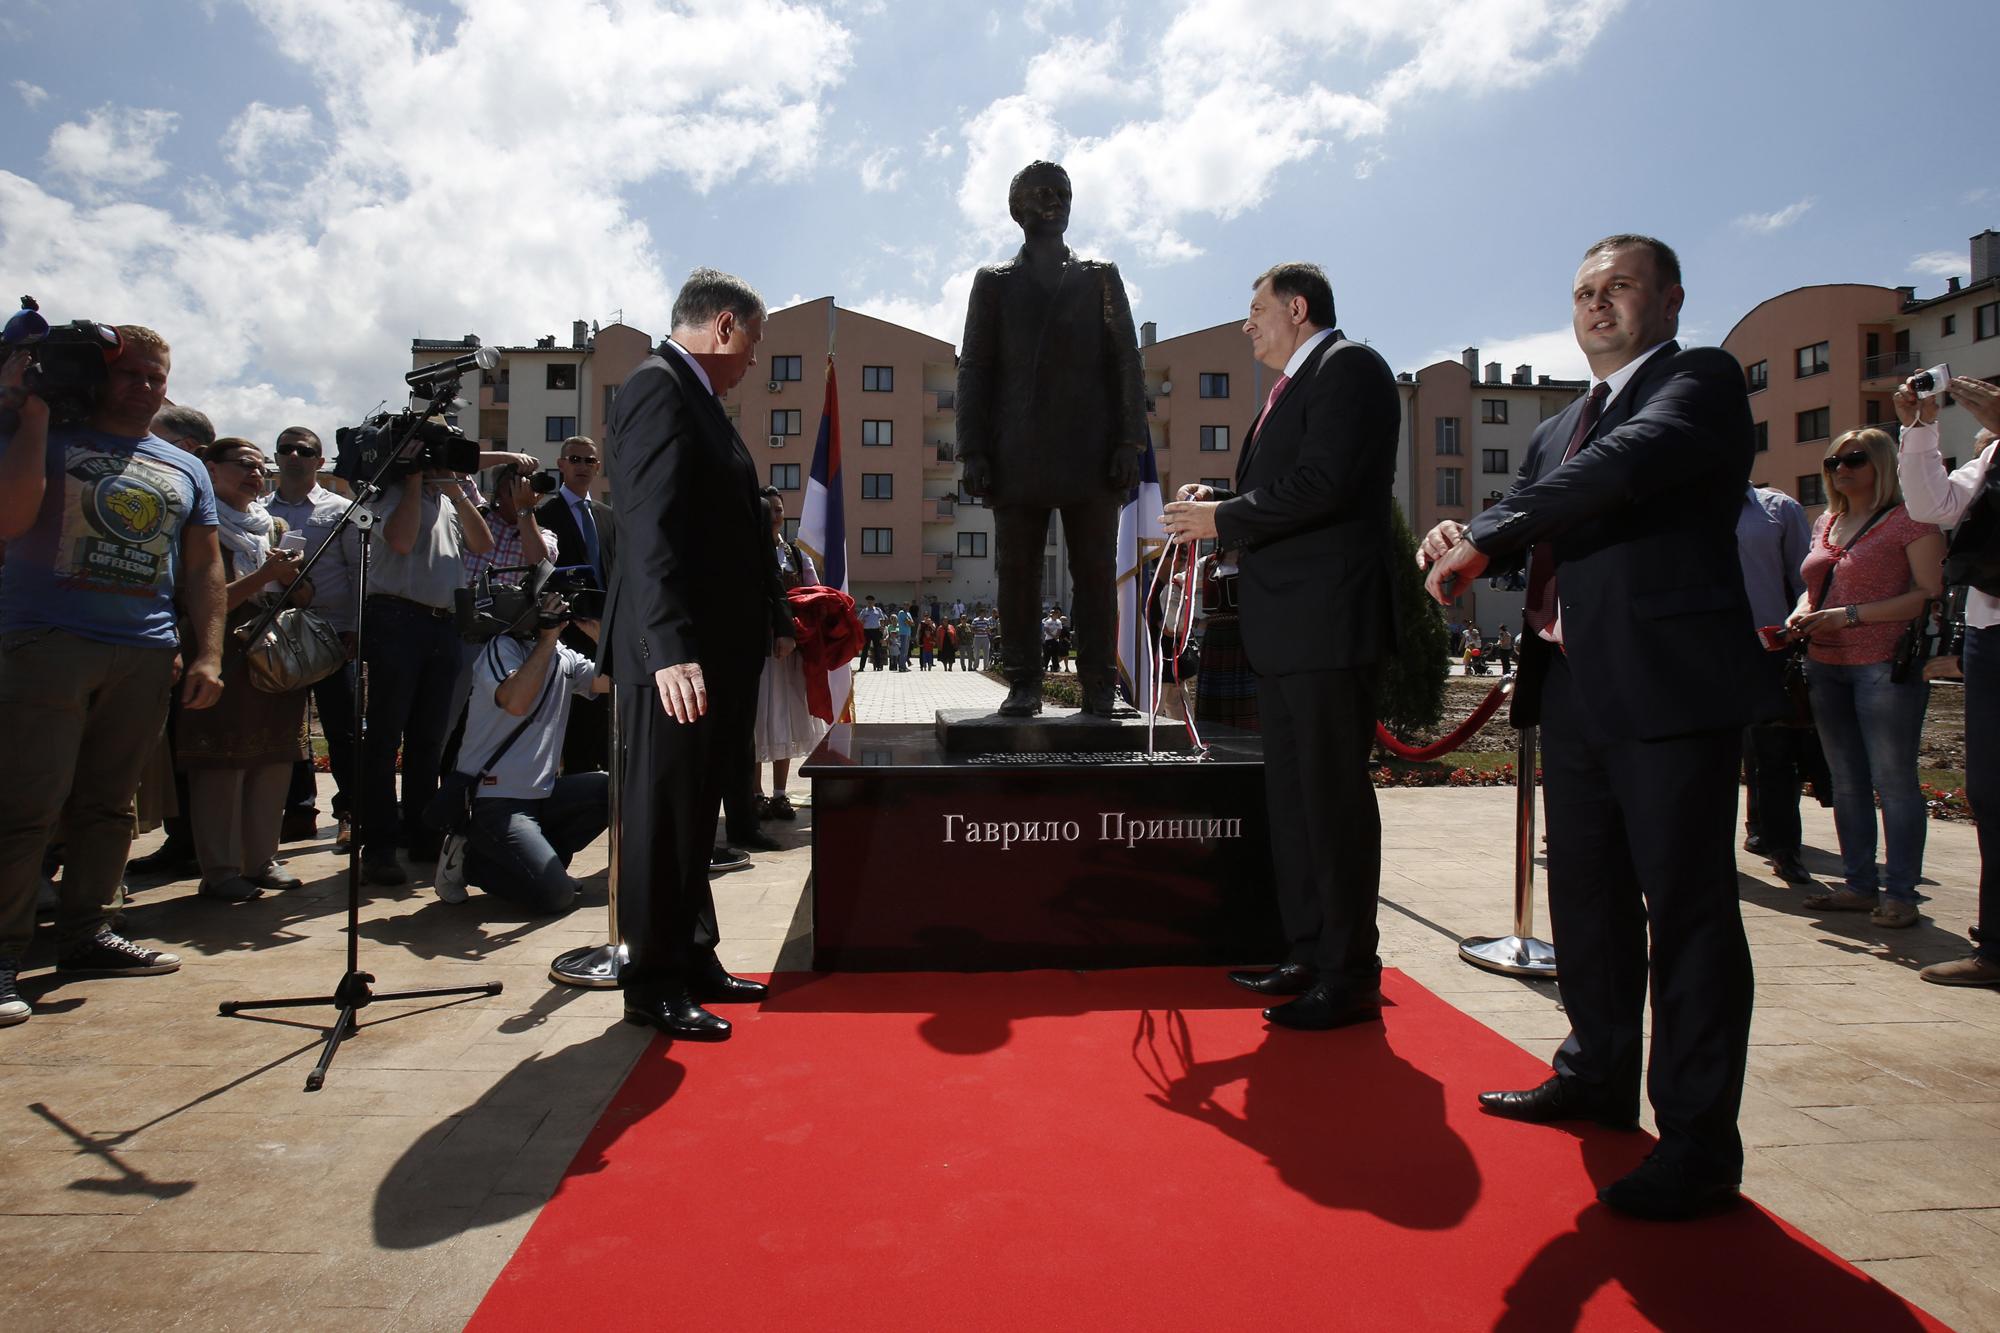 Member of Bosnian Tripartite Presidency Nebojsa Radmanovic, left, President of Republika Srpska Milorad Dodik , center, and local mayor Ljubisa Cosic, right, uncover a statue of Gavrilo Princip during ceremony of unveiling in Istocno Sarajevo, June 27, 2014.